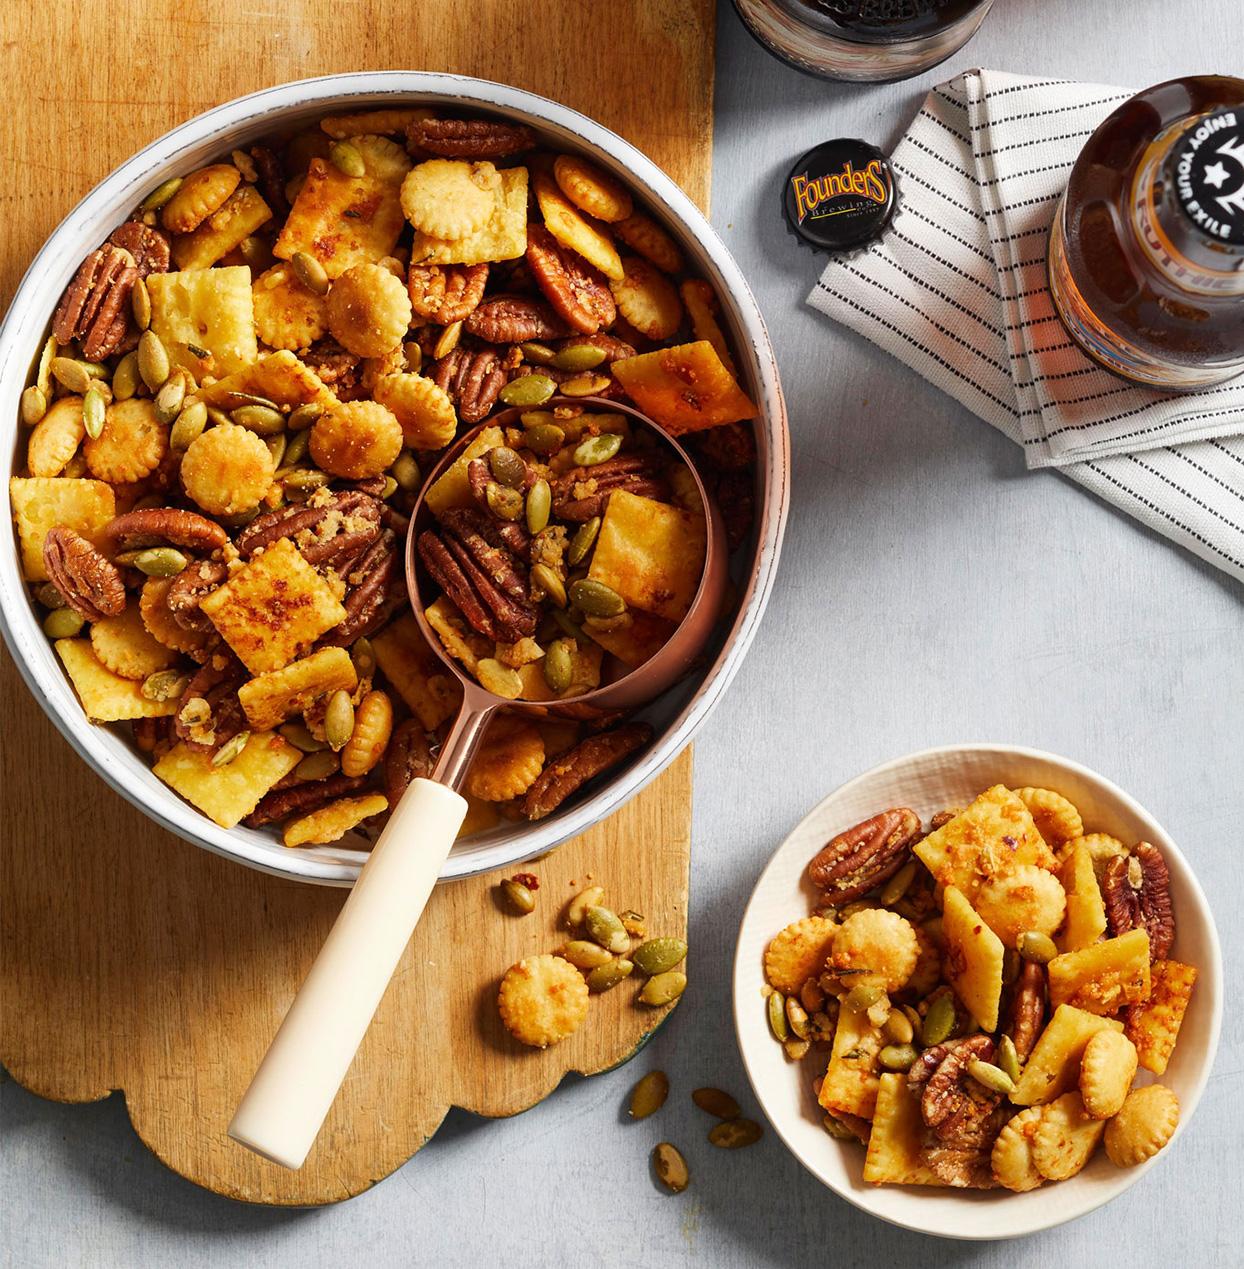 Cheesy Rosemary and Pecan Snack Mix